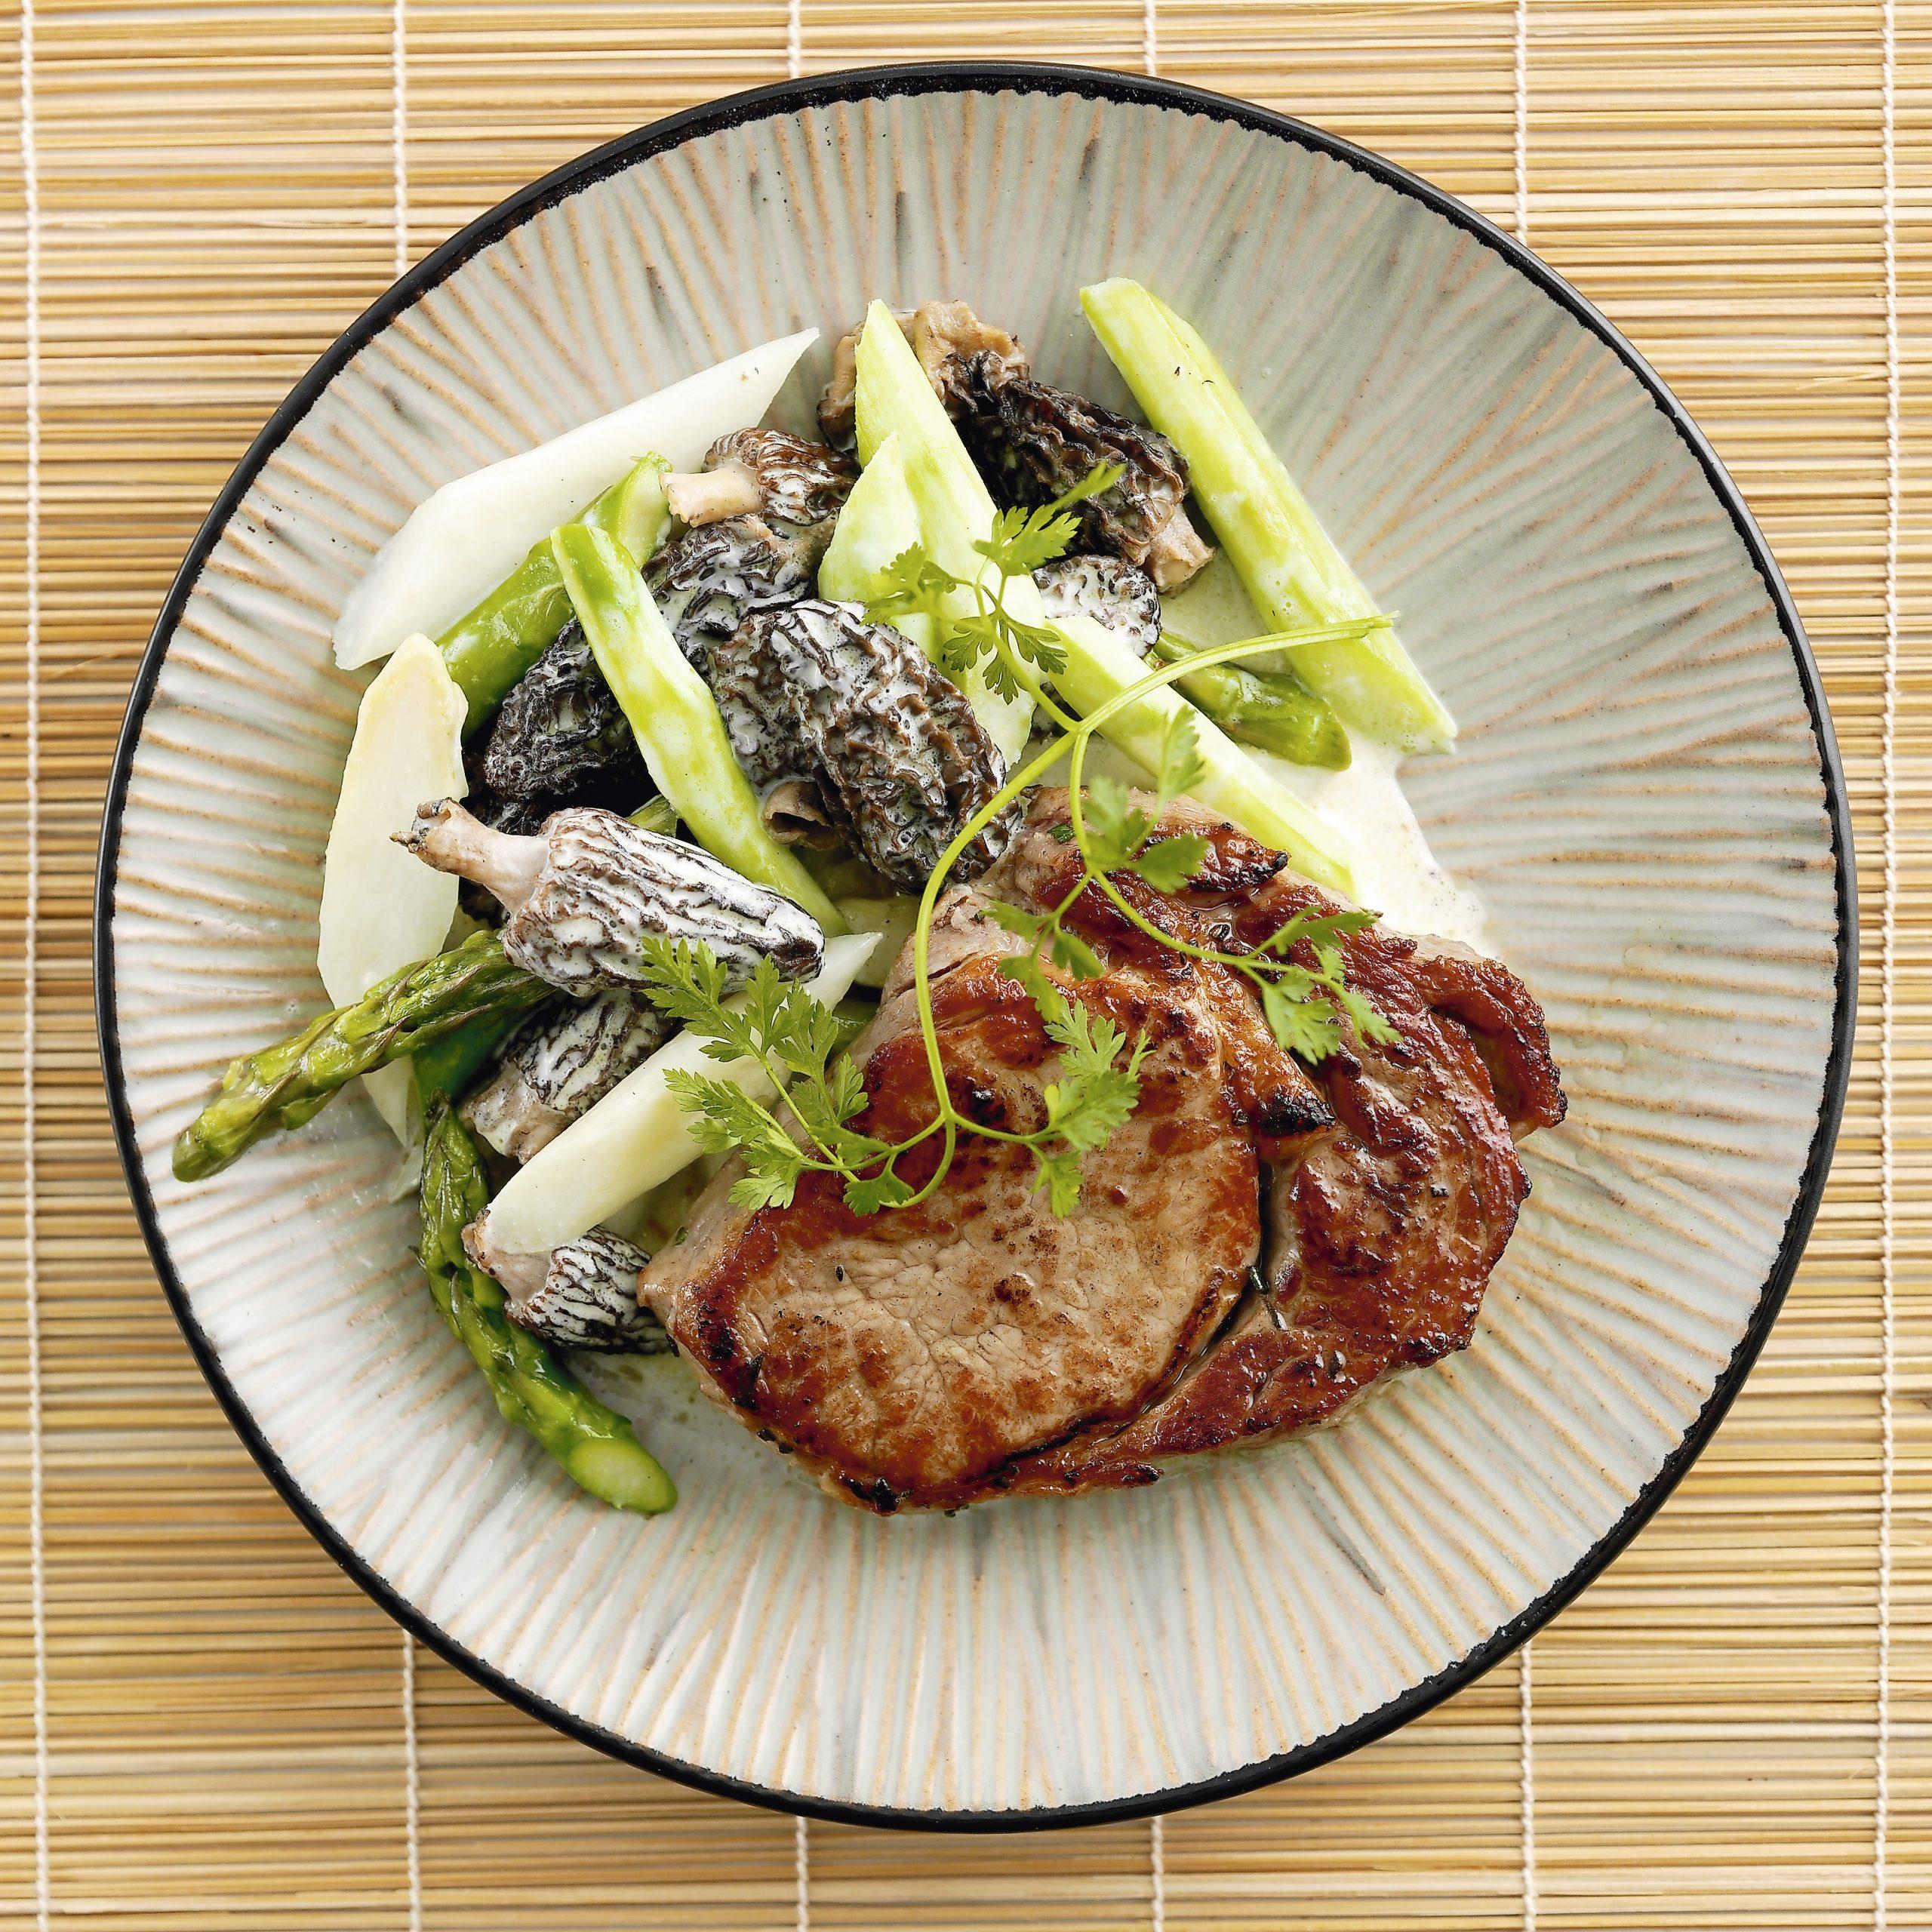 Kalbssteak mit Spargel-Morchel-Gemüse (Low Carb)